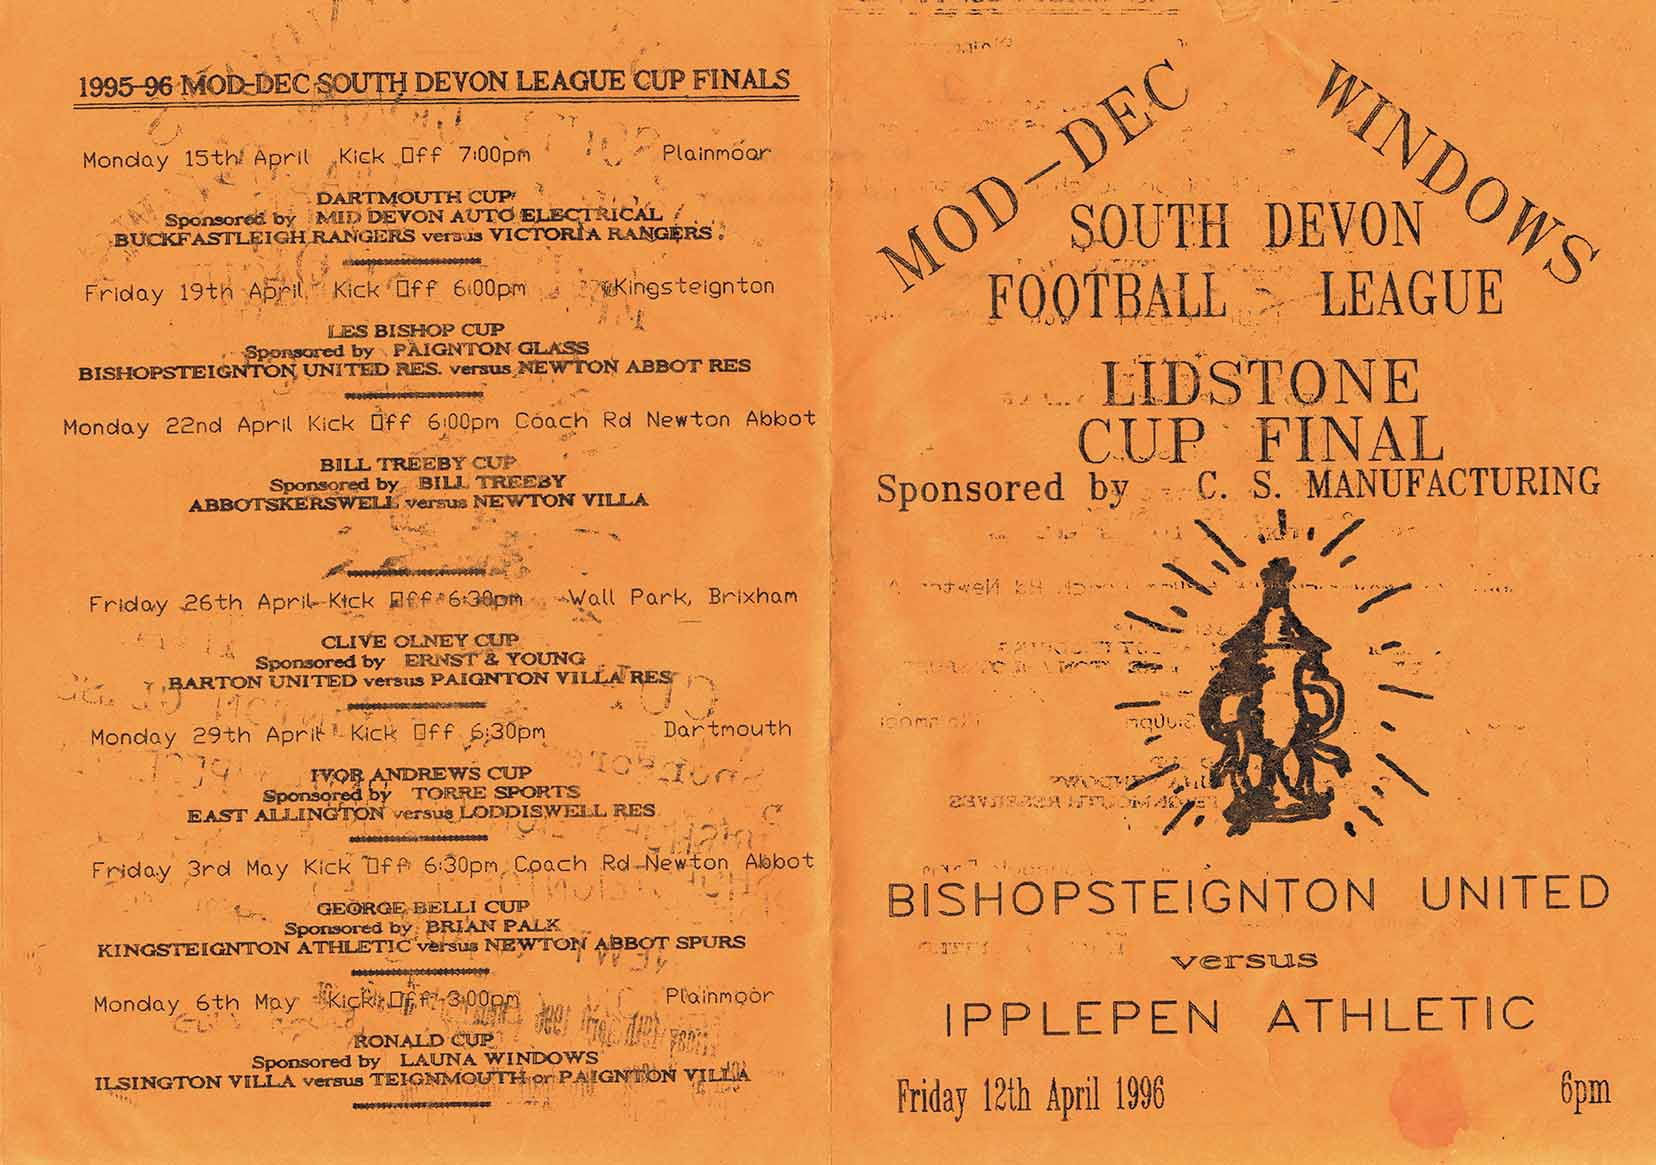 Programme for South Devon Football League Lidstone Cup Final front